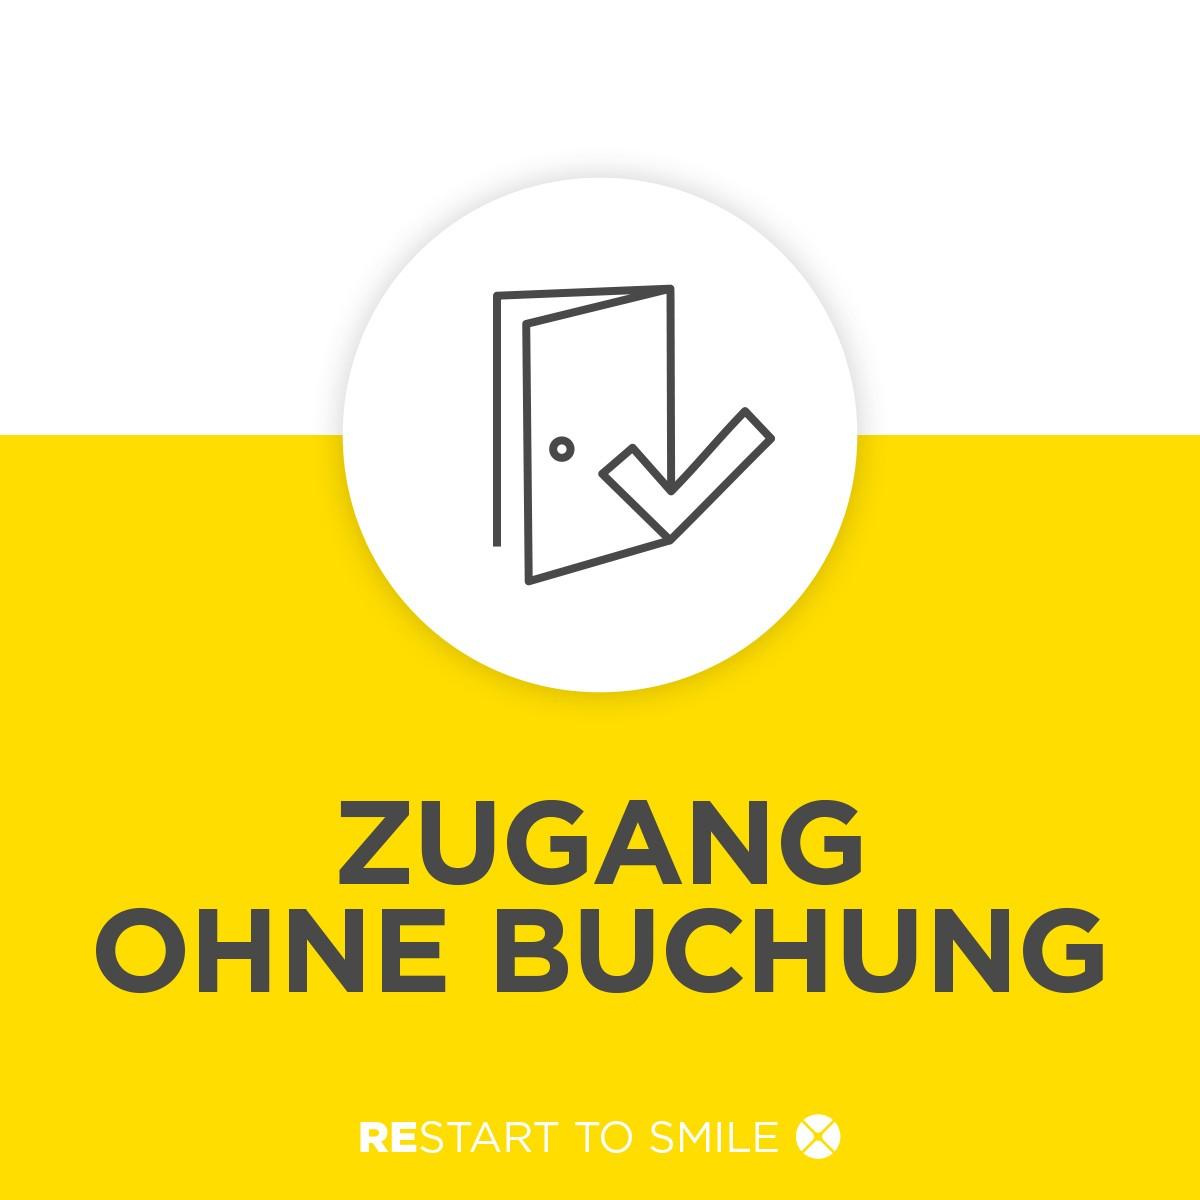 ZUGANG OHNE BUCHUNG.